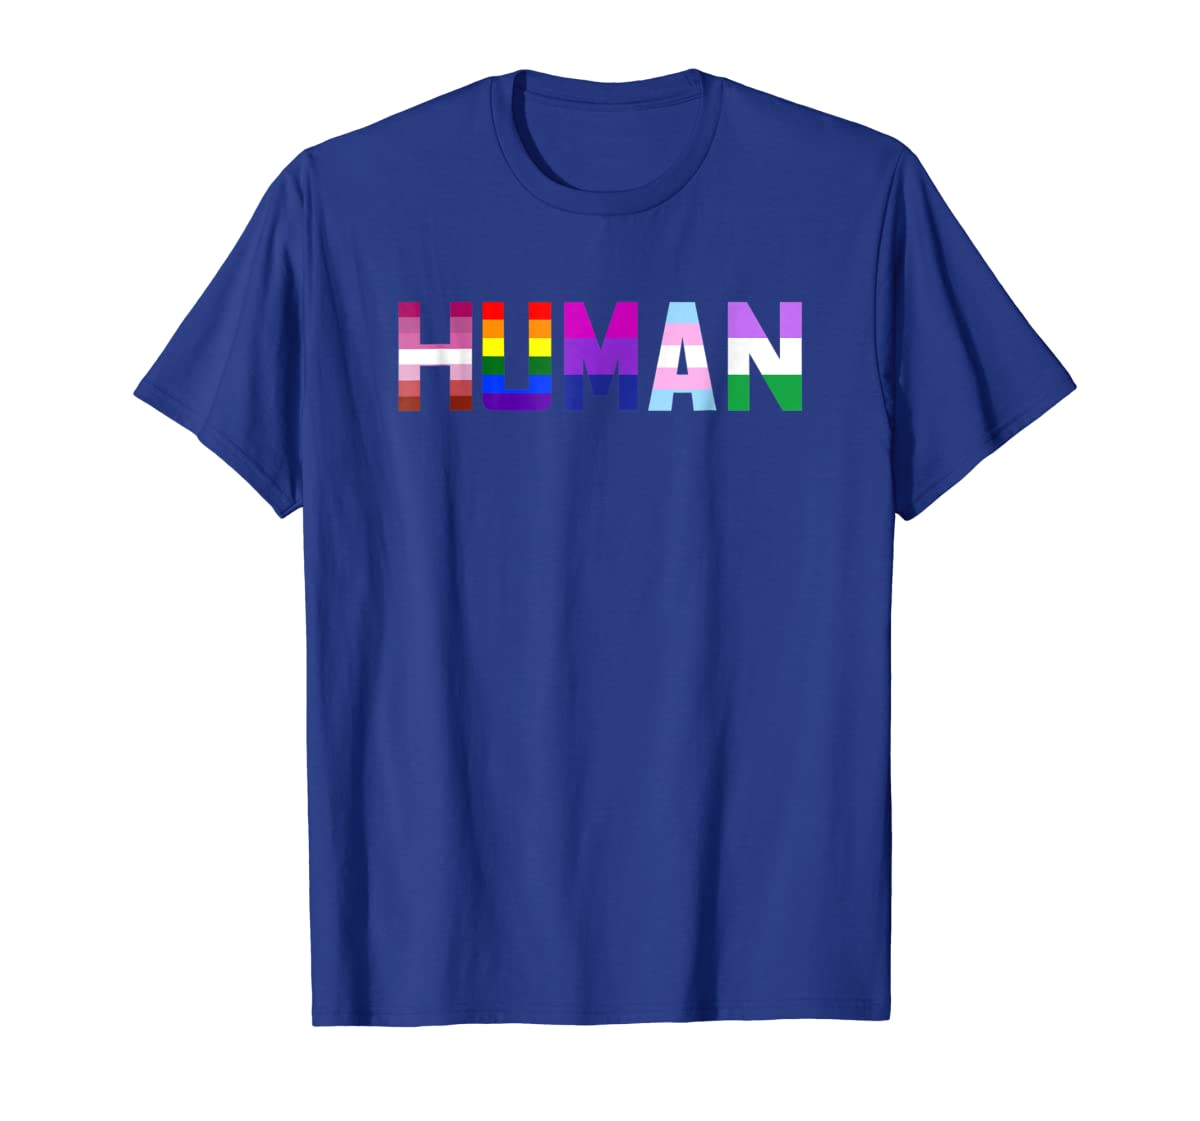 HUMAN Flag LGBT Gay Pride Month Transgender Ally T Shirt-Men's T-Shirt-Royal